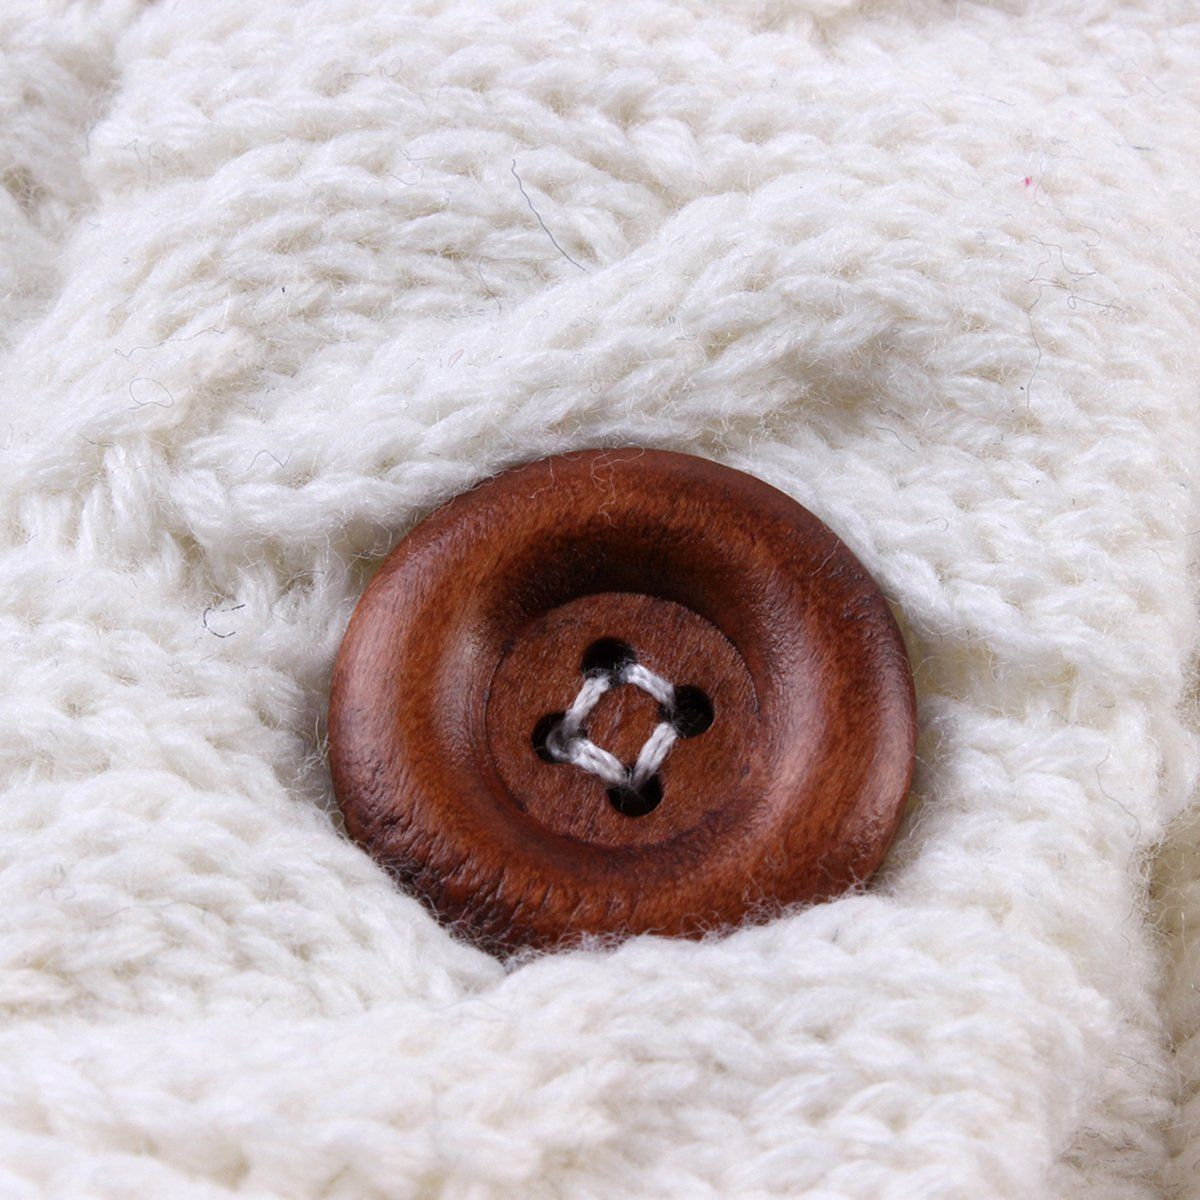 Newborn Baby Winter Warm Sleeping Bags Infant Button Knit Swaddle Wrap Swaddling Stroller Wrap Toddler Blanket Sleeping Bags 5